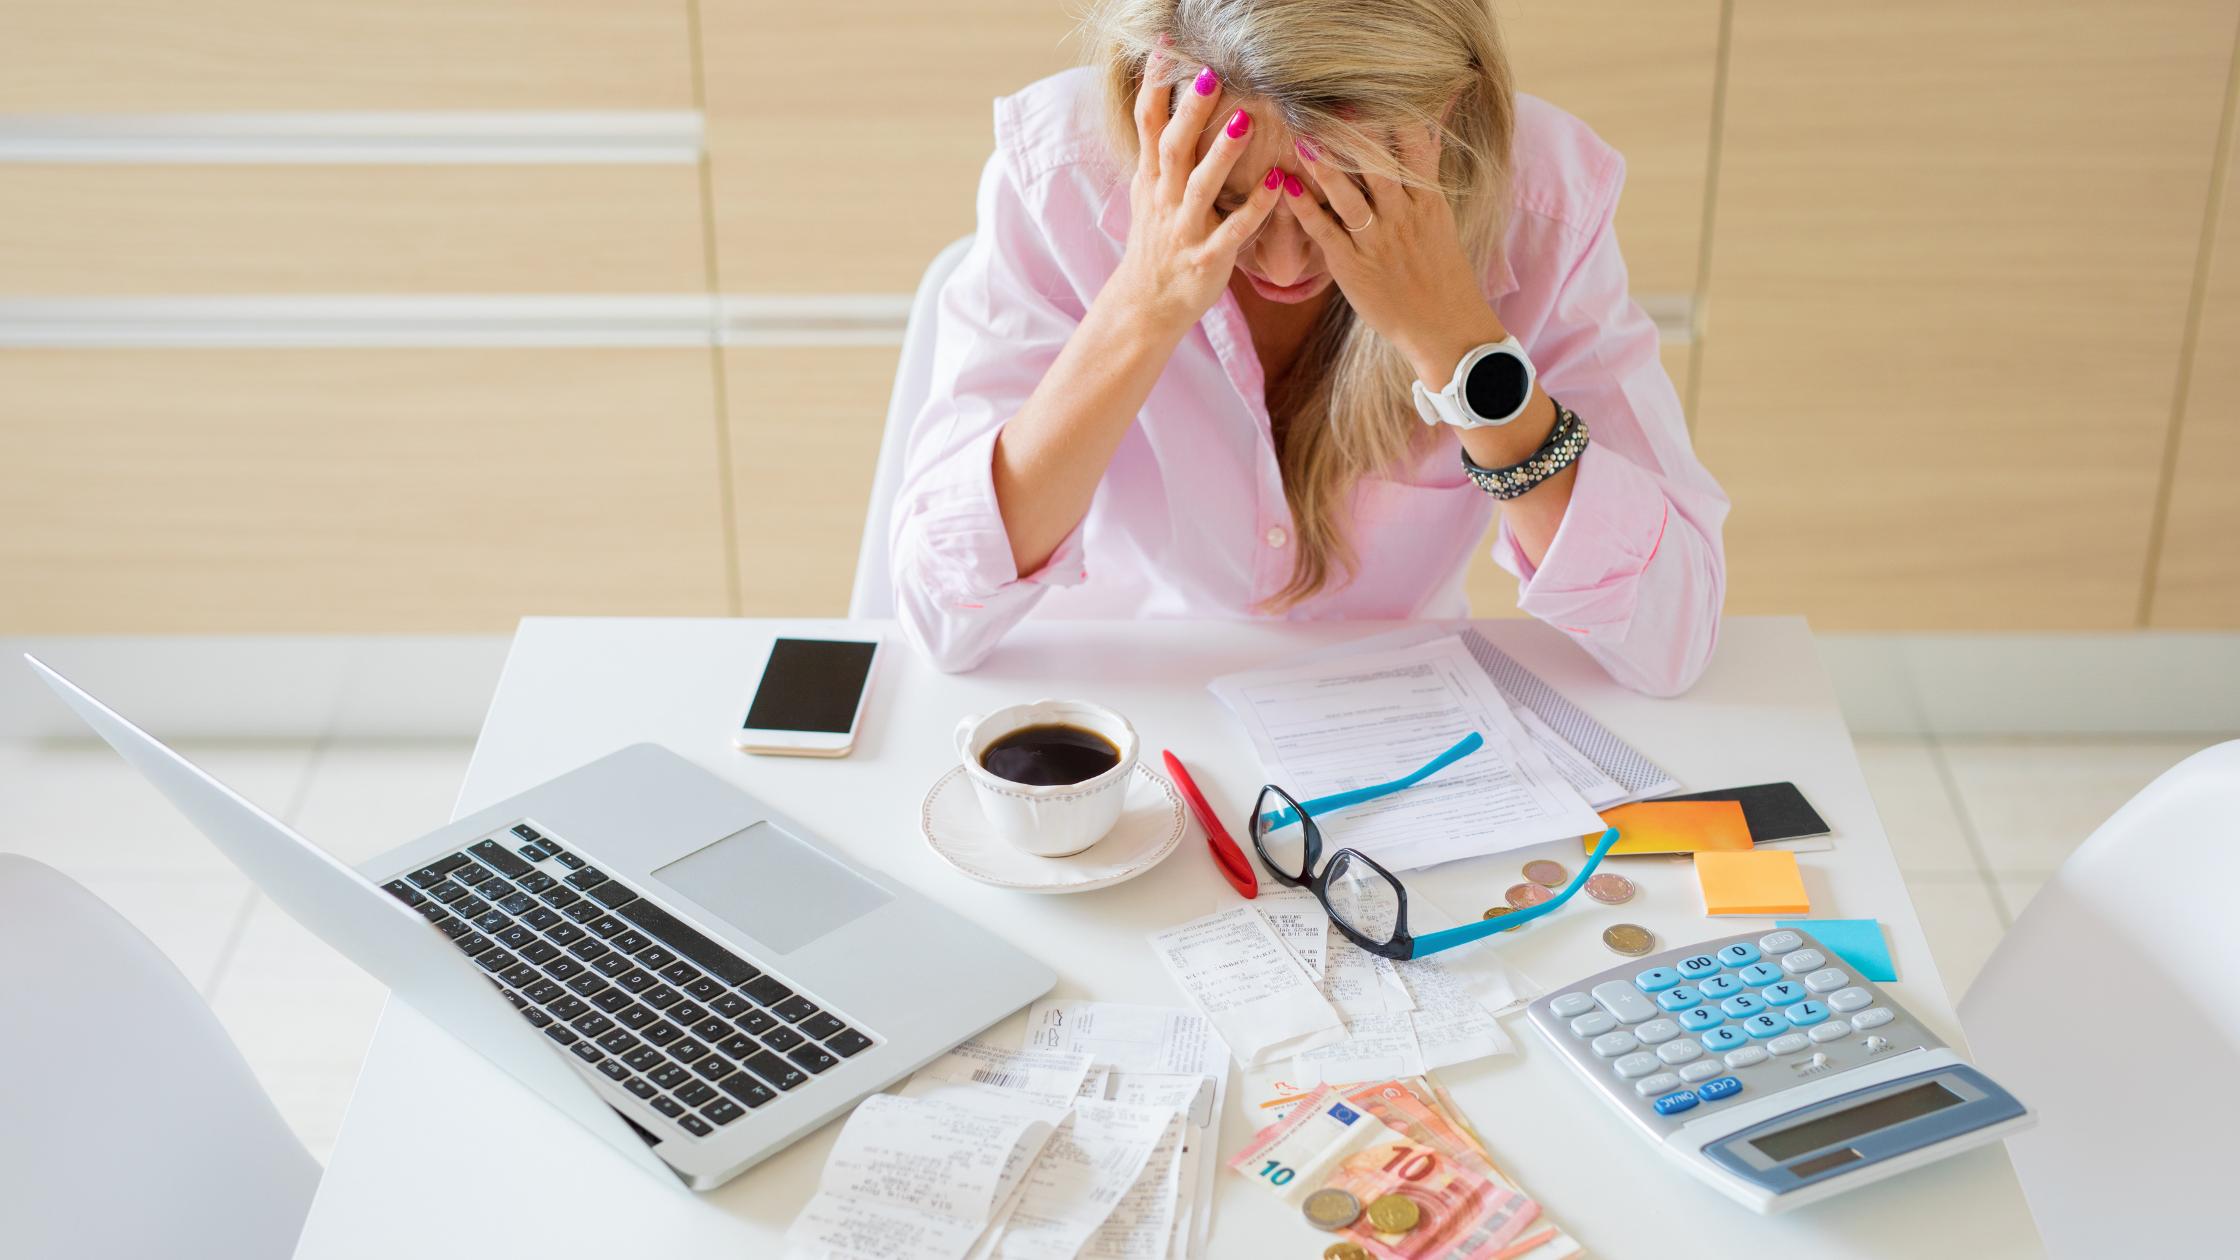 Cash flow concerns affect entrepreneurs